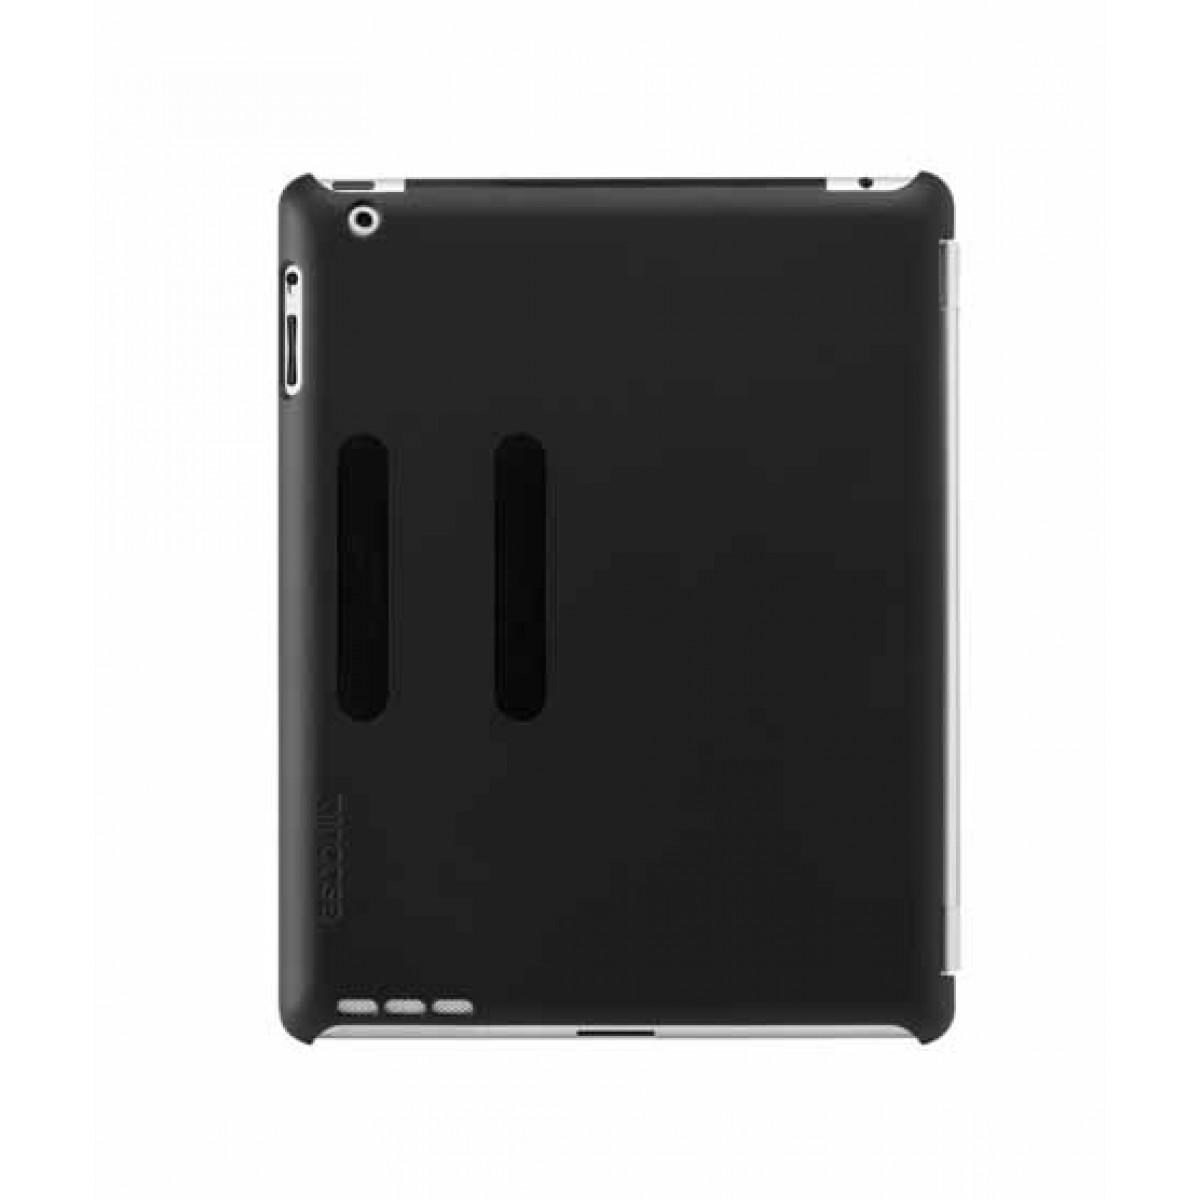 Incase Mag Snap Case for iPad